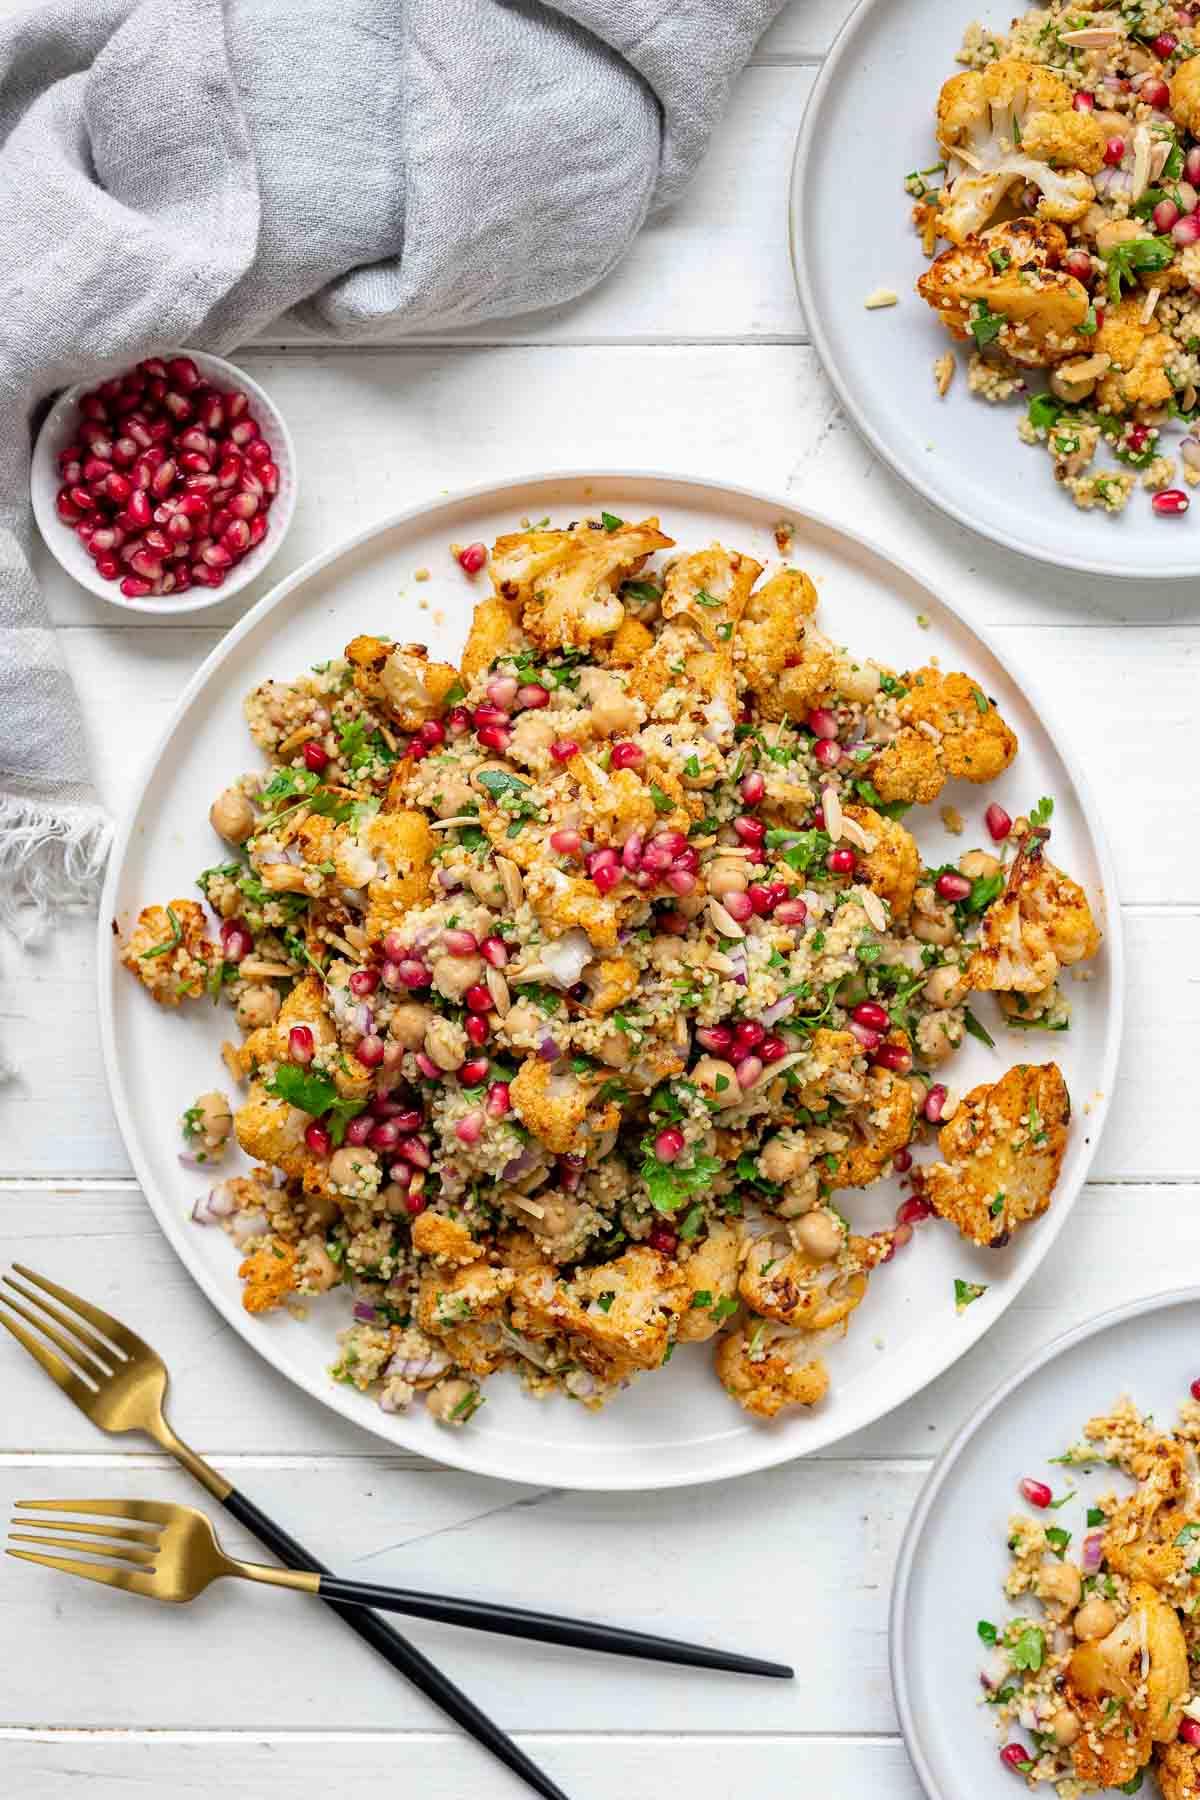 Gerösteter Harissa-Blumenkohl mit Kichererbsen & Hirse Rezept